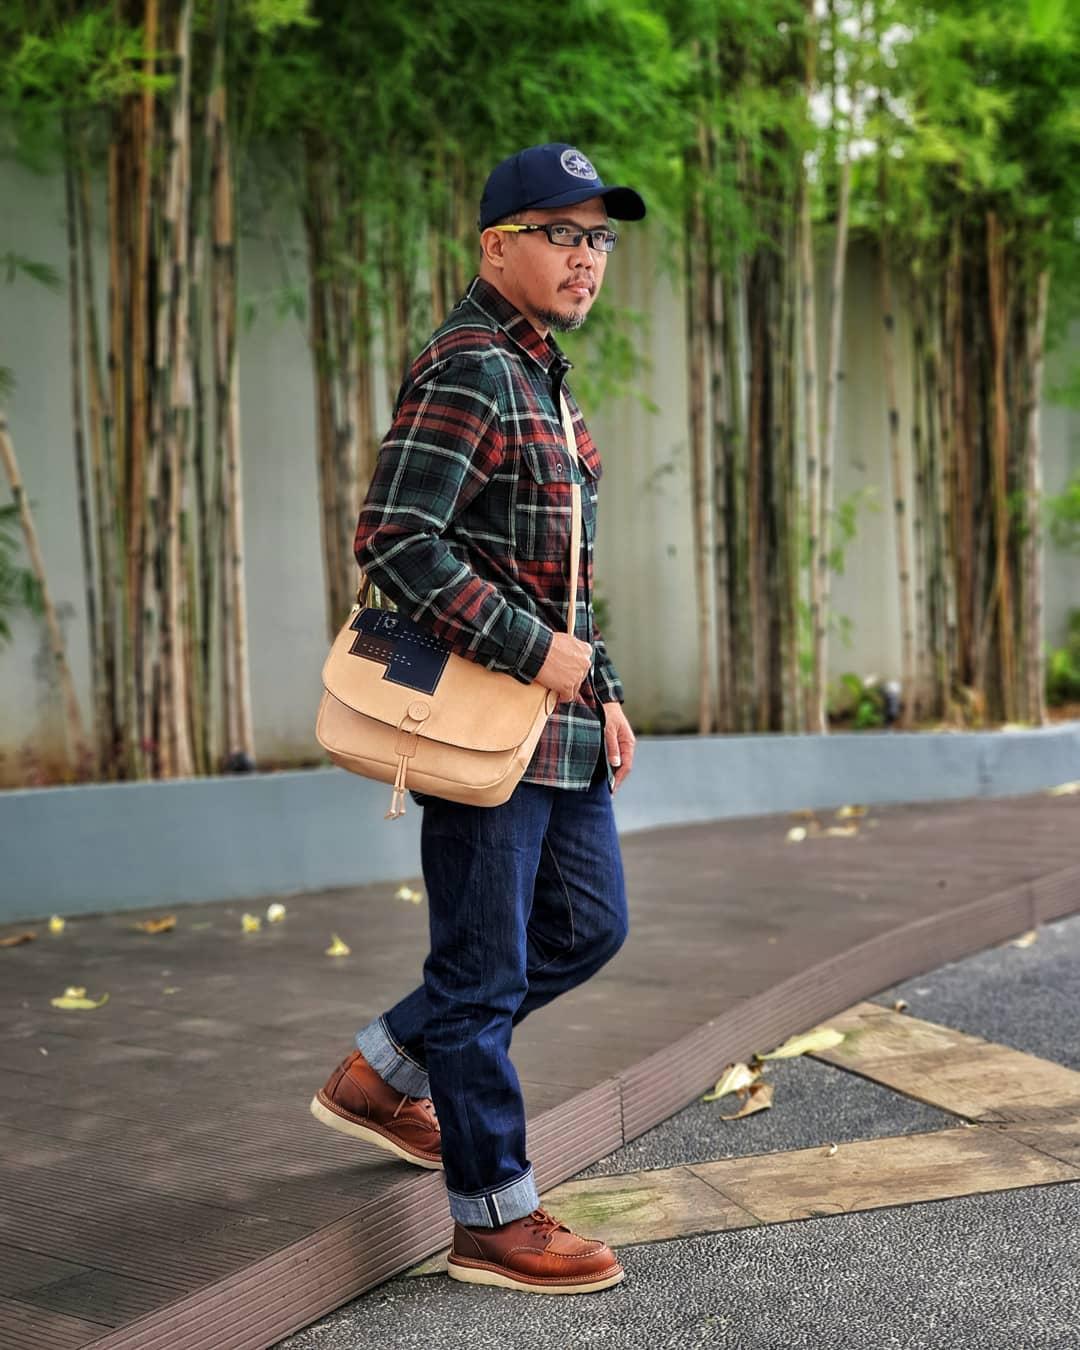 Plaid Rugged Style Ideas for Men -hedihadian